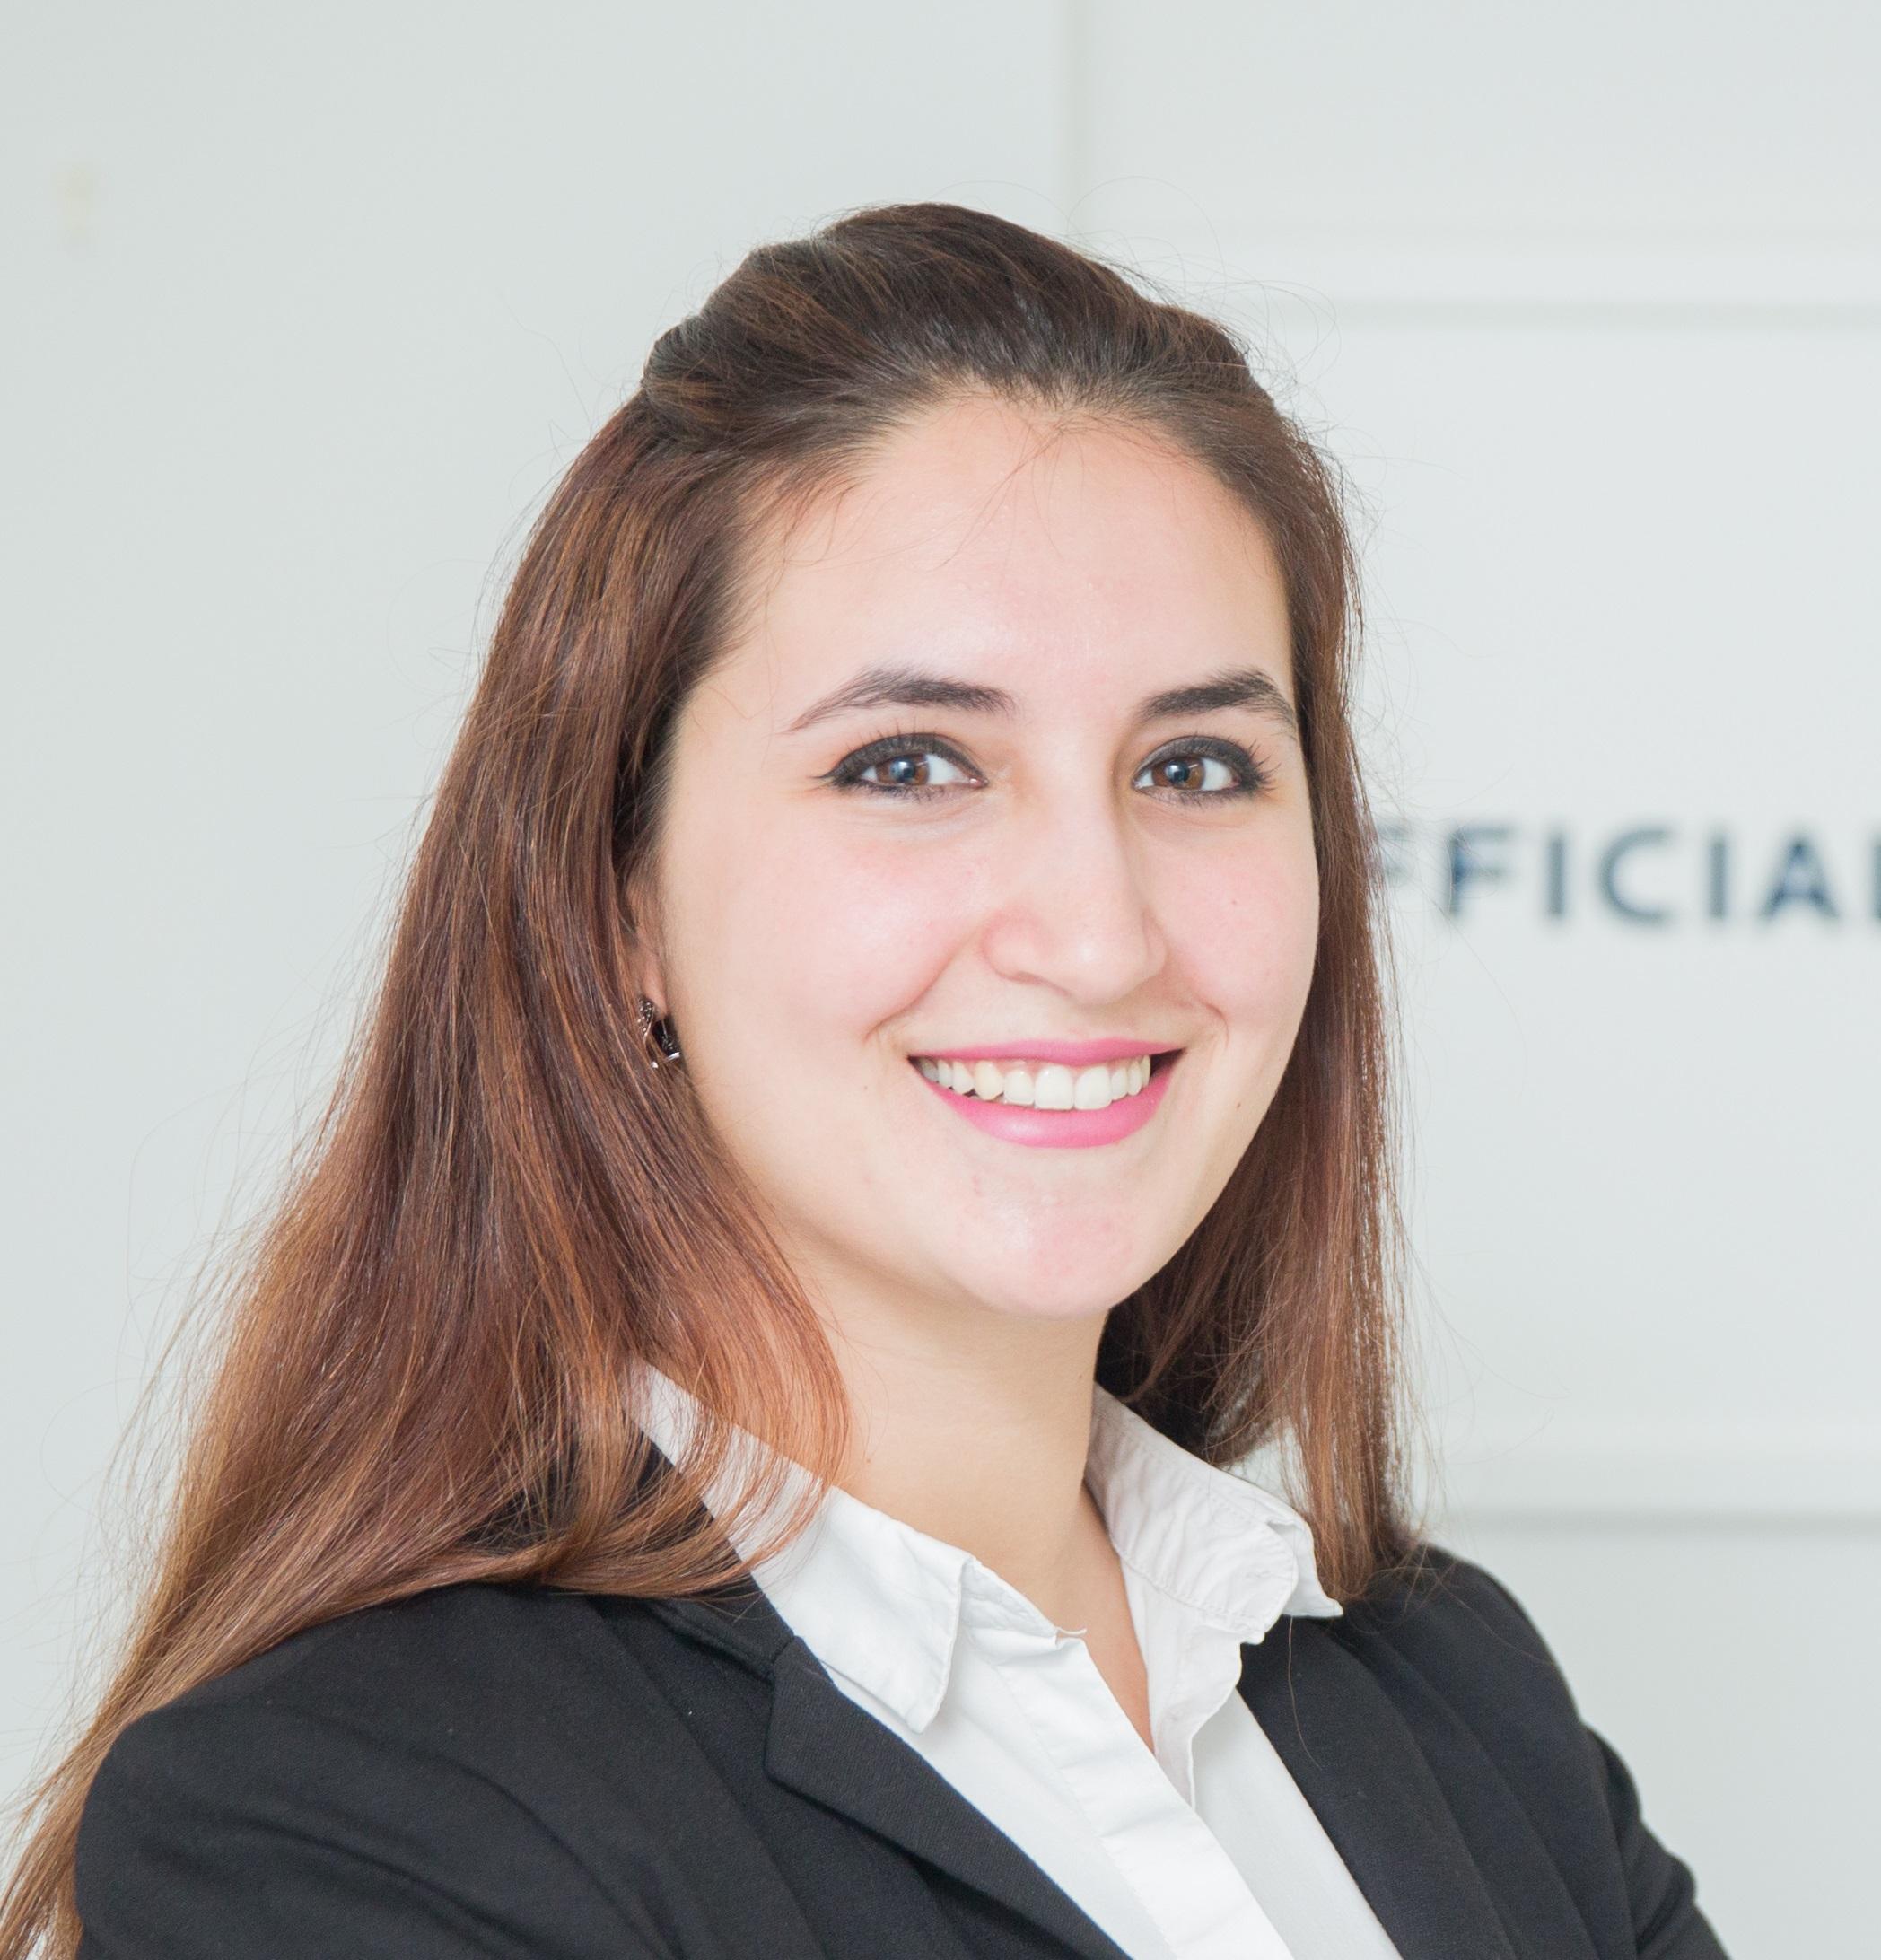 Leila Issa